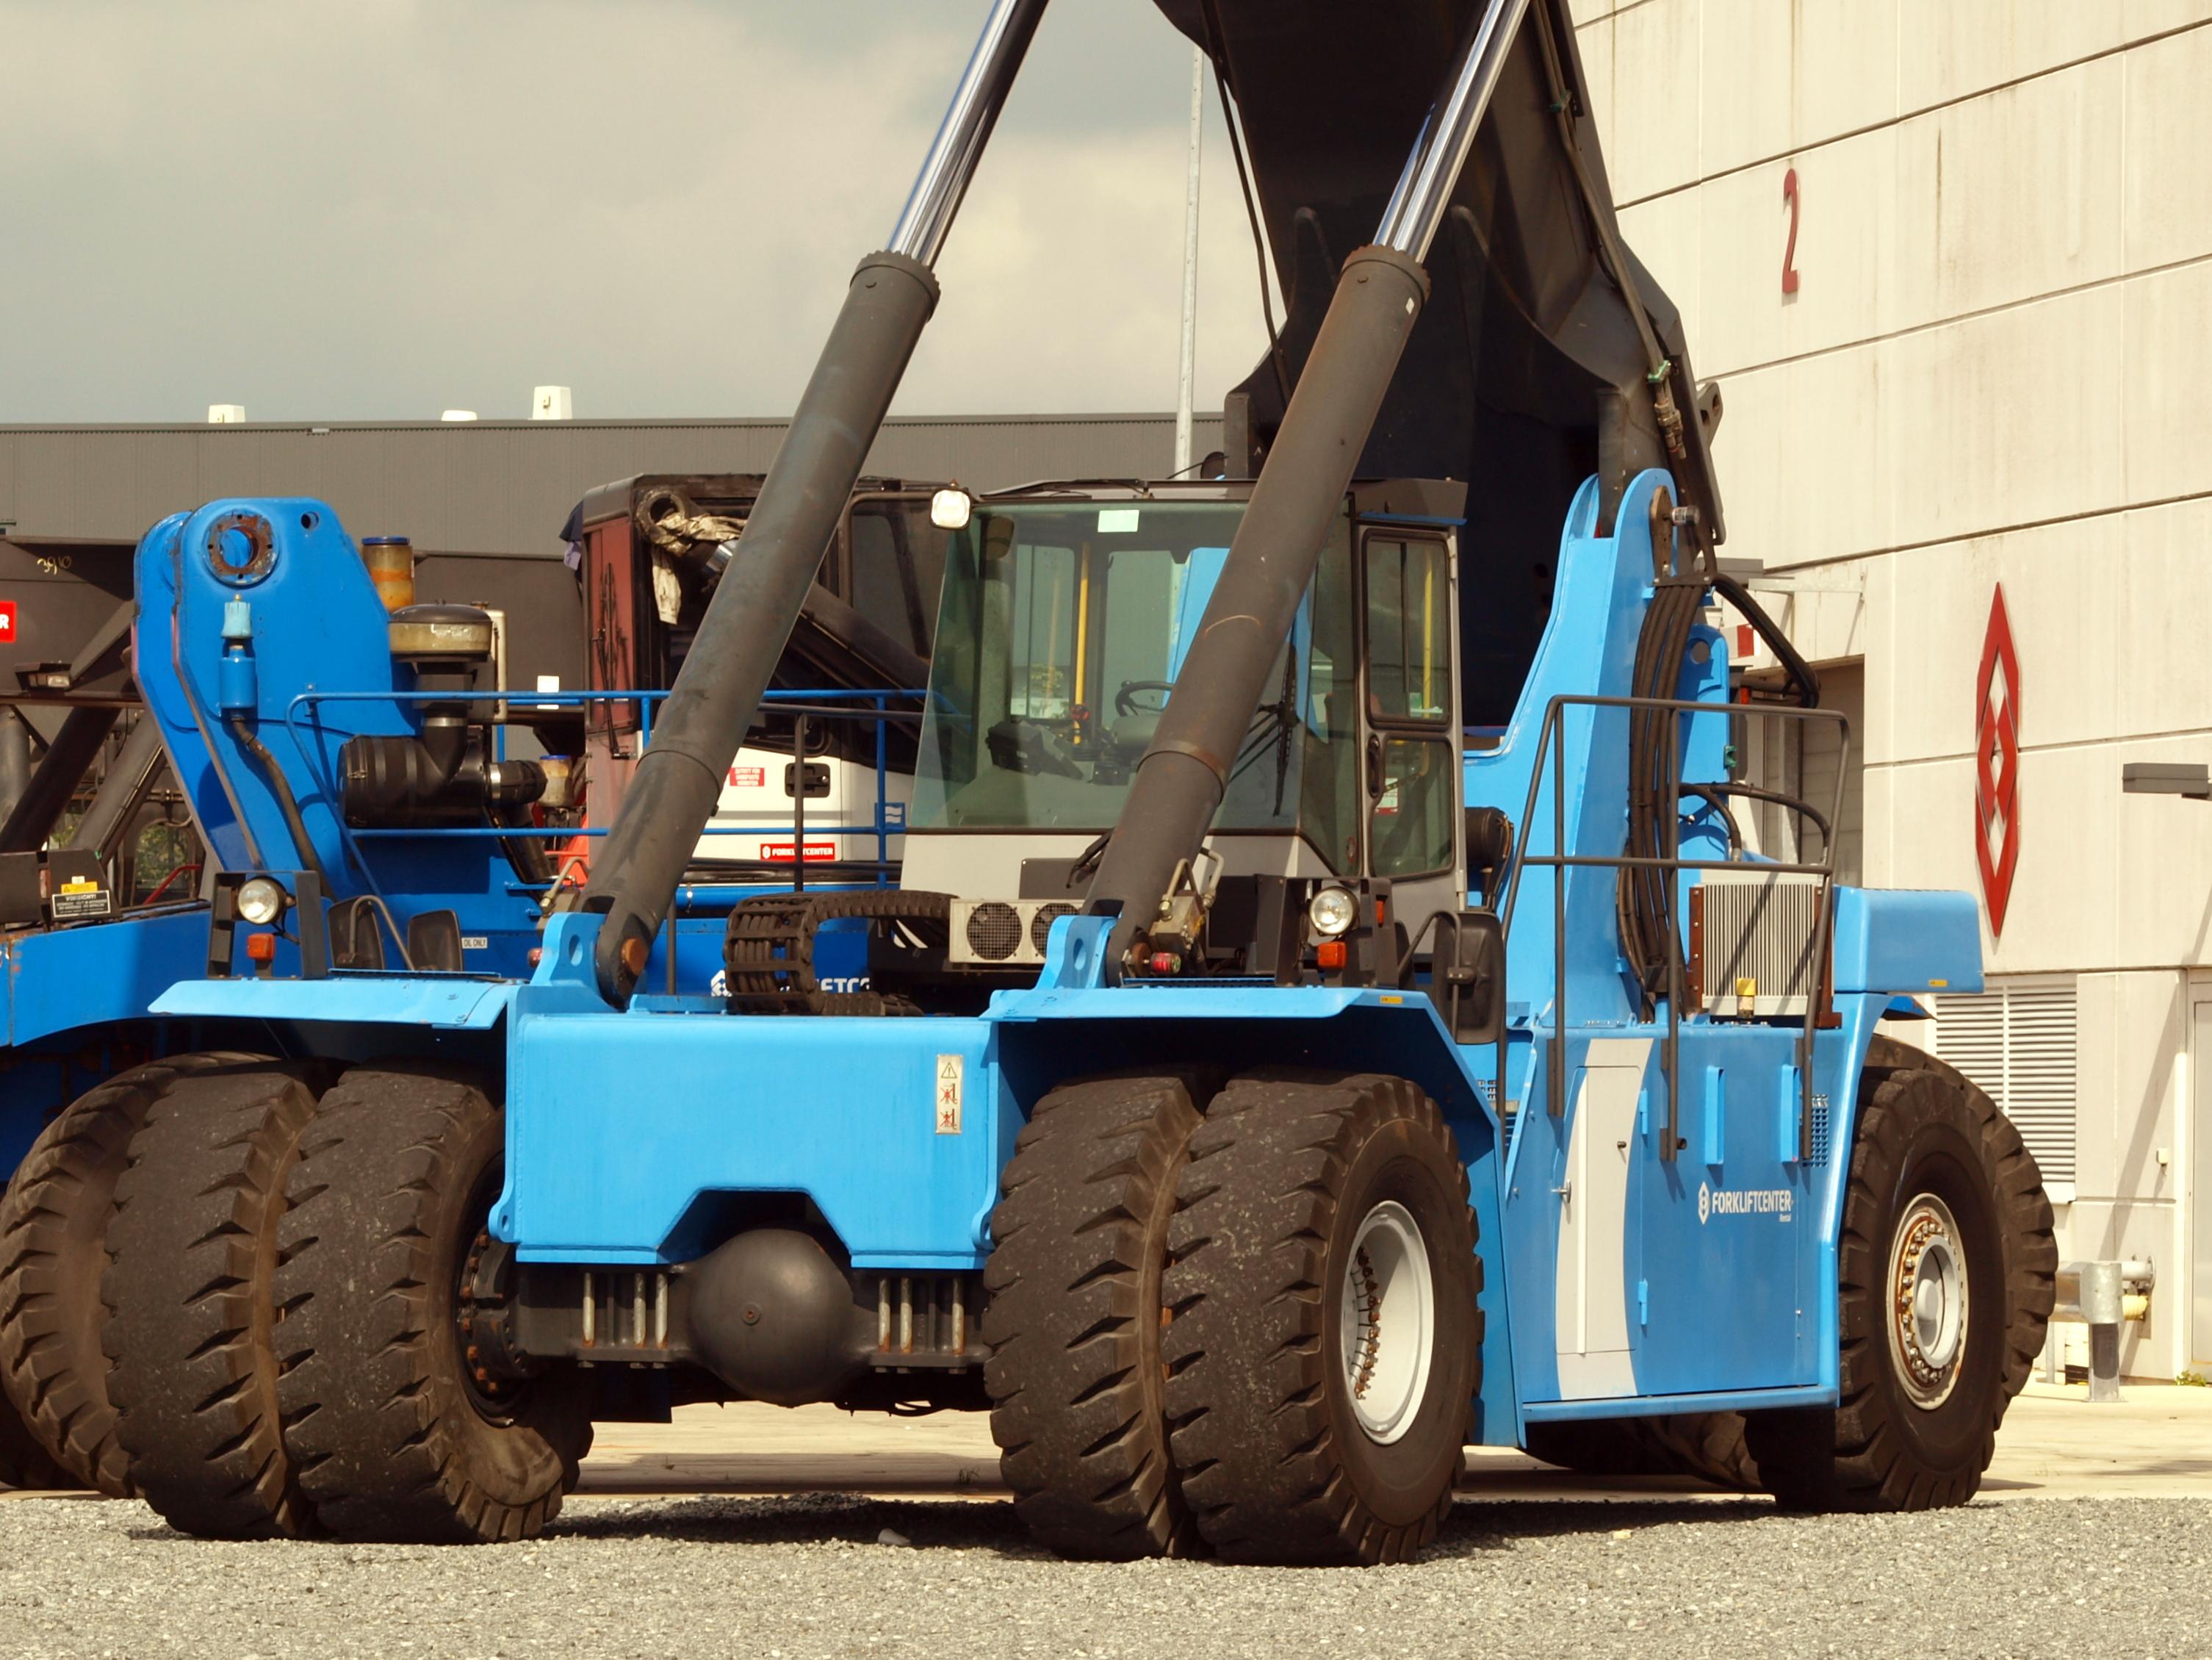 file kalmar reach stacker blue jpg wikimedia commons rh commons wikimedia org kalmar reach stacker service manual Kalmar Reach Stacker PDF